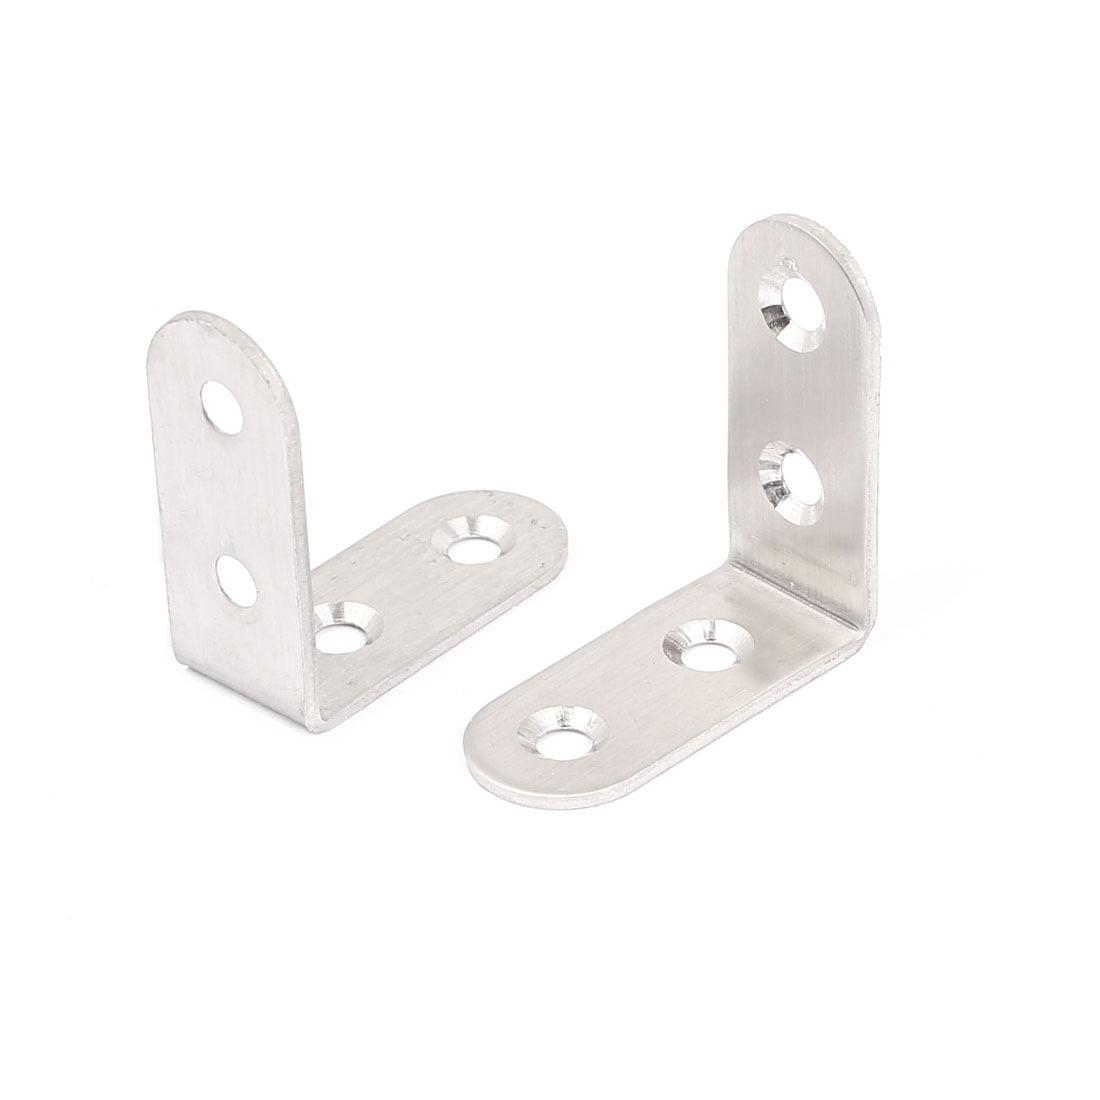 40mmx40mm L Shape Stainless Steel Shelf Corner Brace Repair Angle Bracket 2pcs